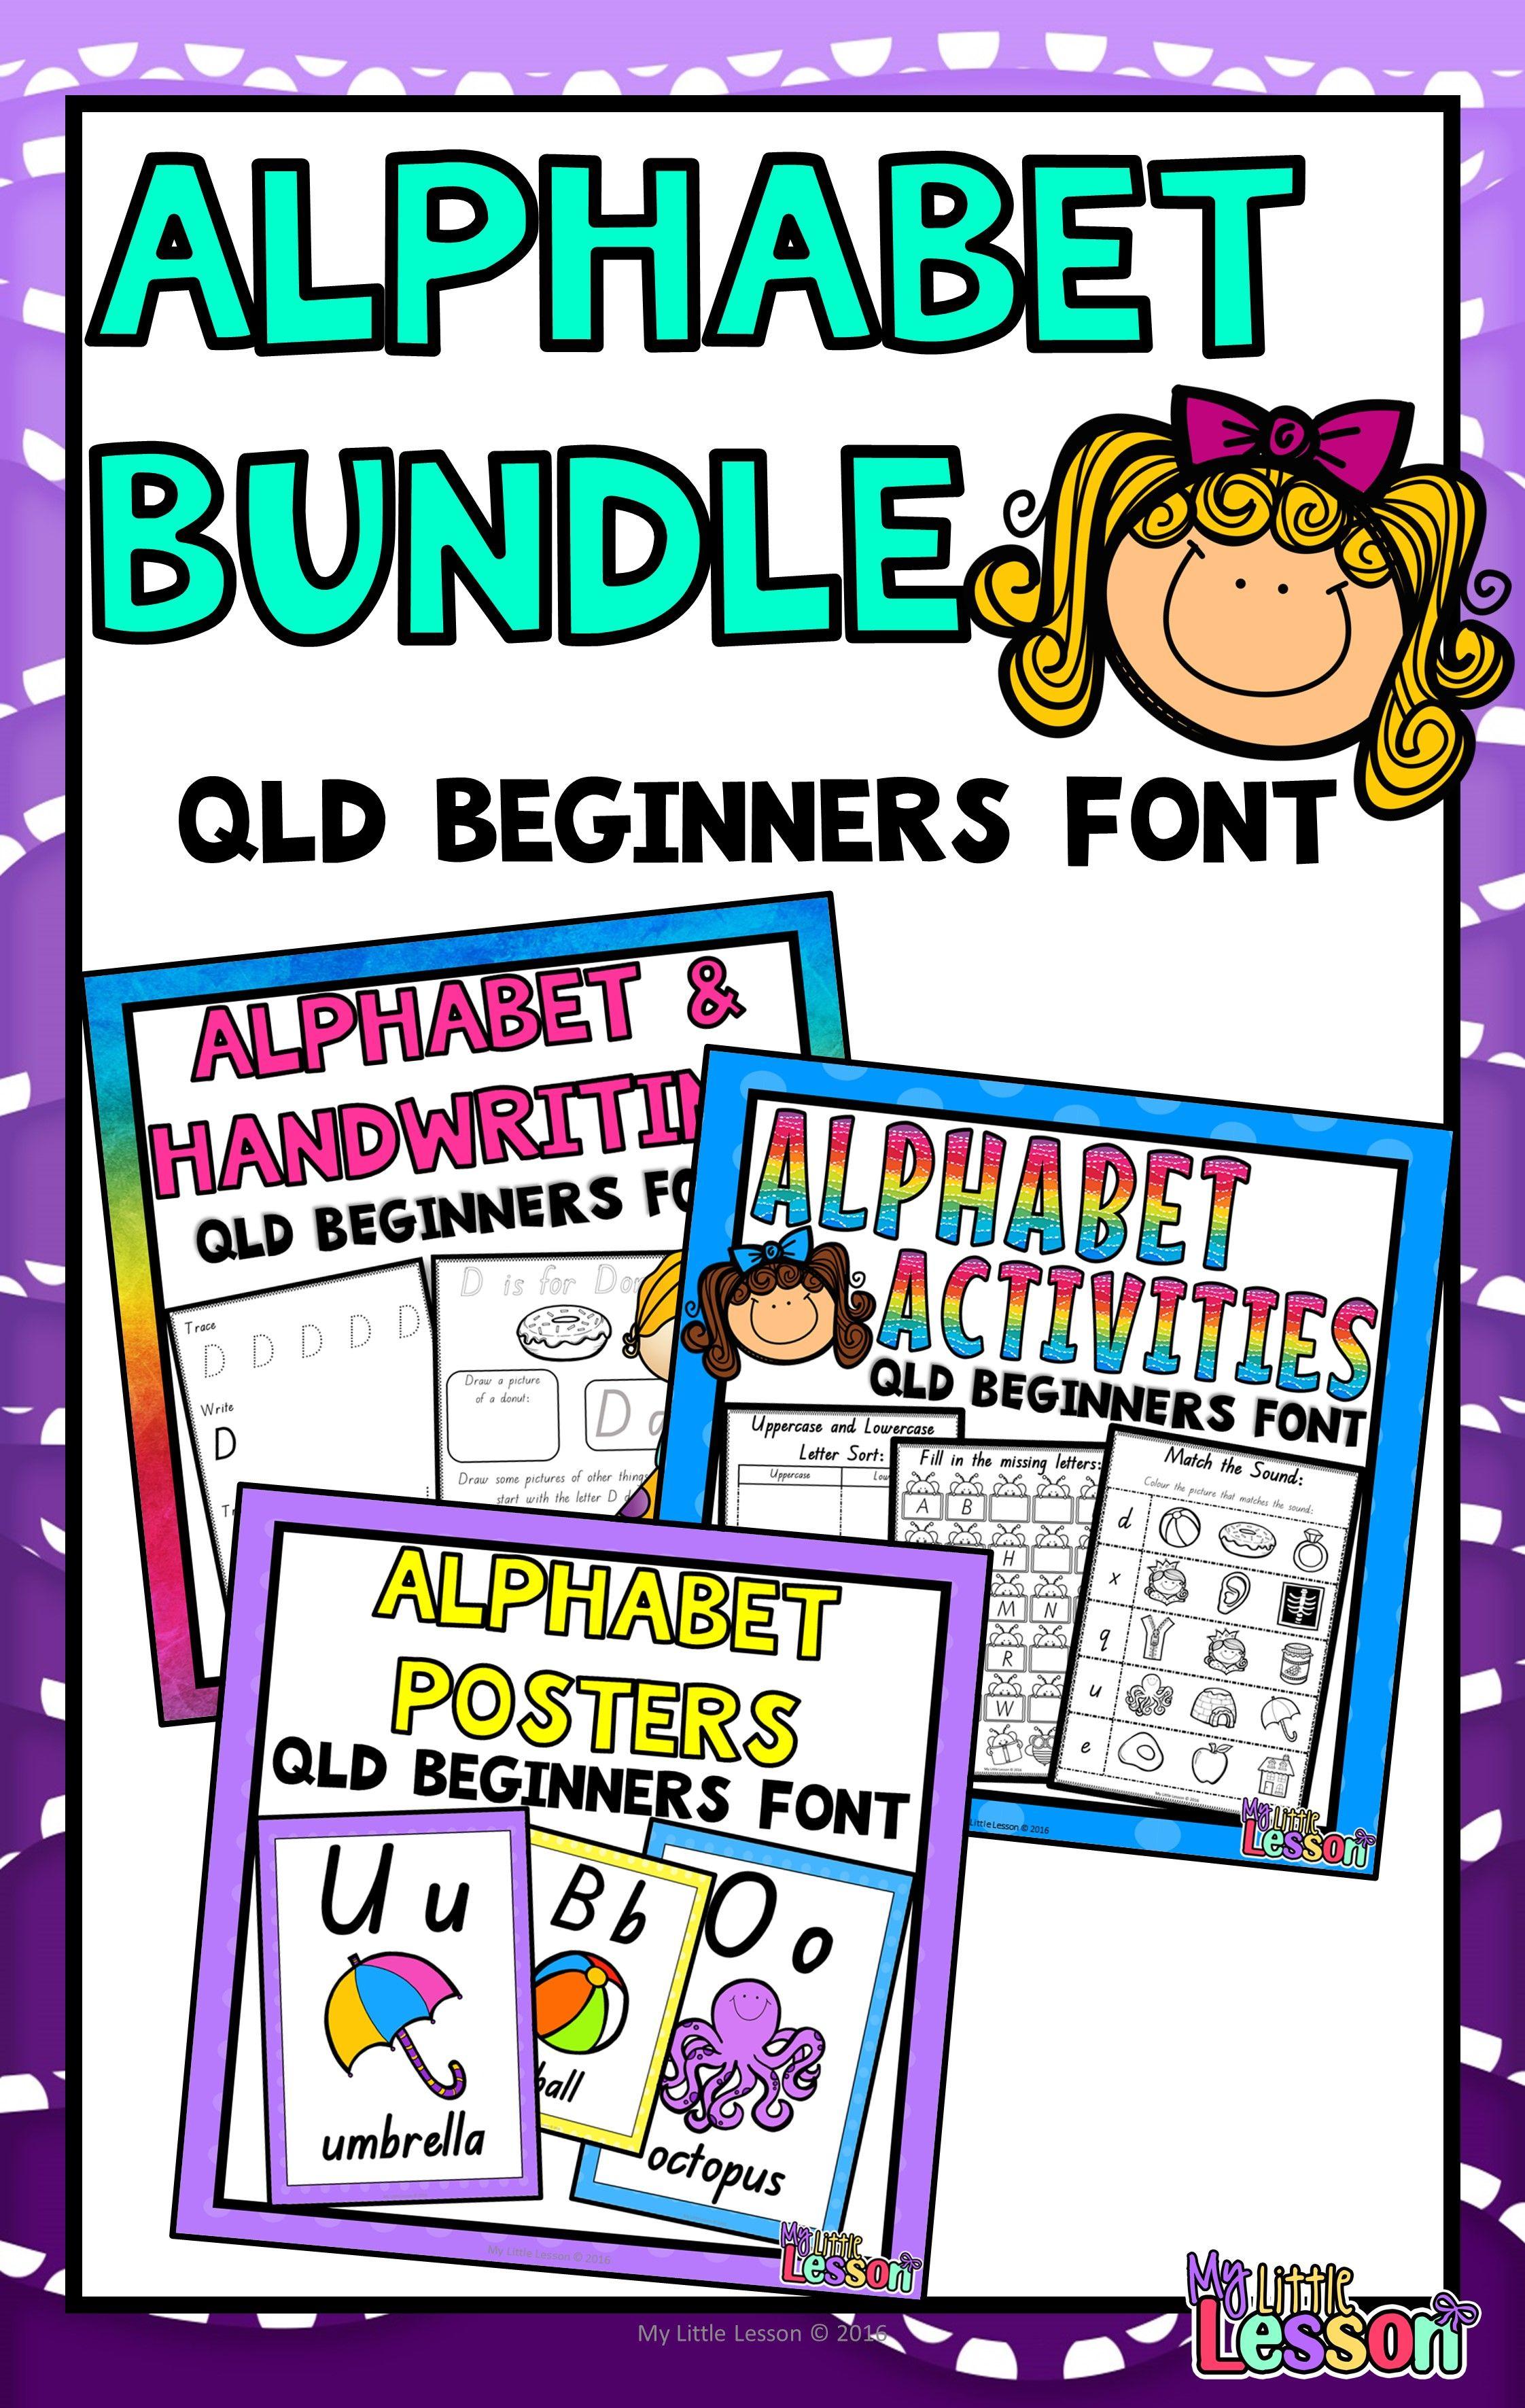 Alphabet Bundle Qld Beginners Font Worksheets Posters